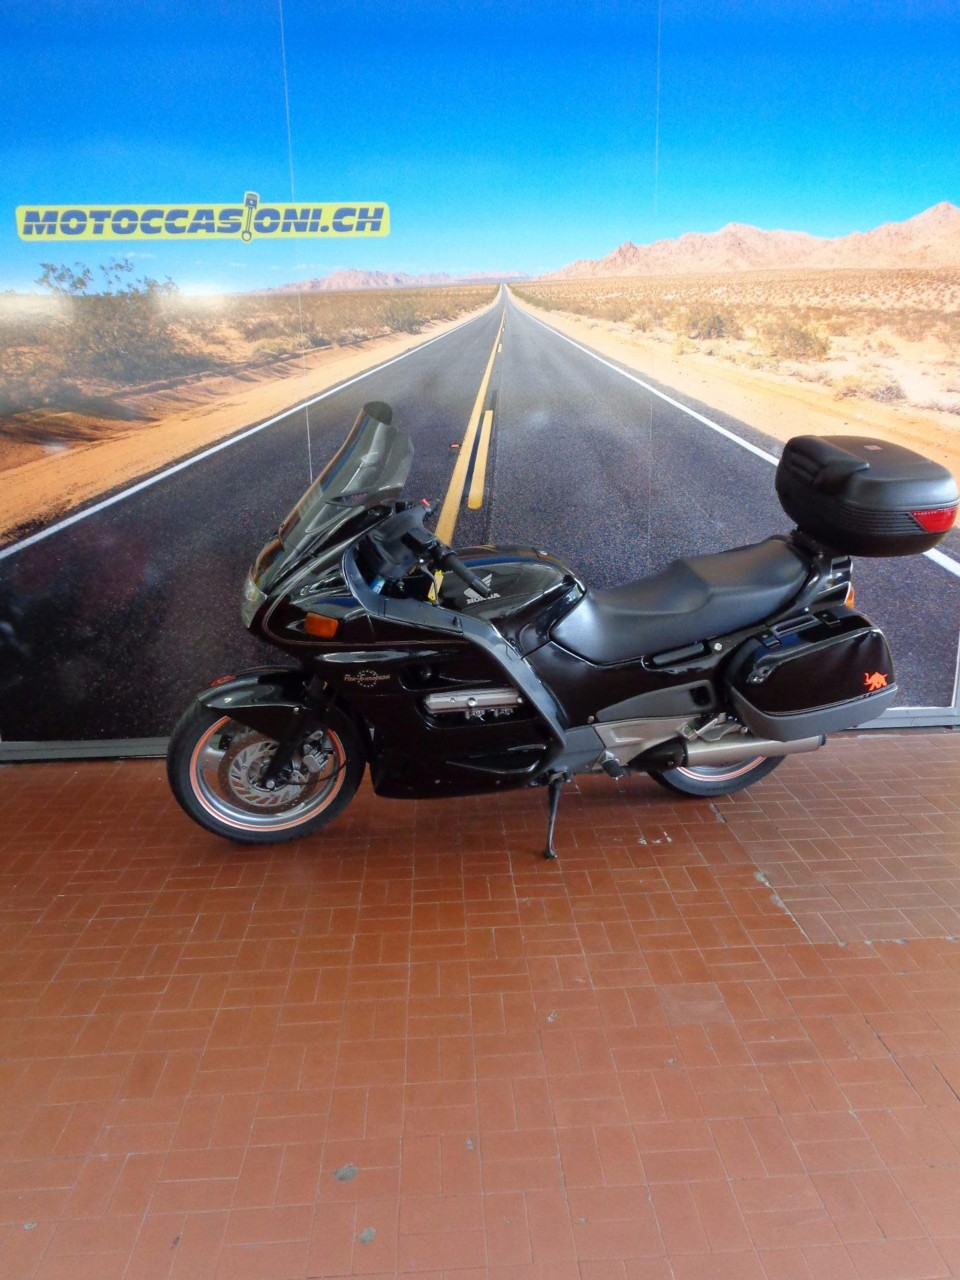 moto occasions acheter honda st 1100 pan european motoccasioni sa grancia. Black Bedroom Furniture Sets. Home Design Ideas